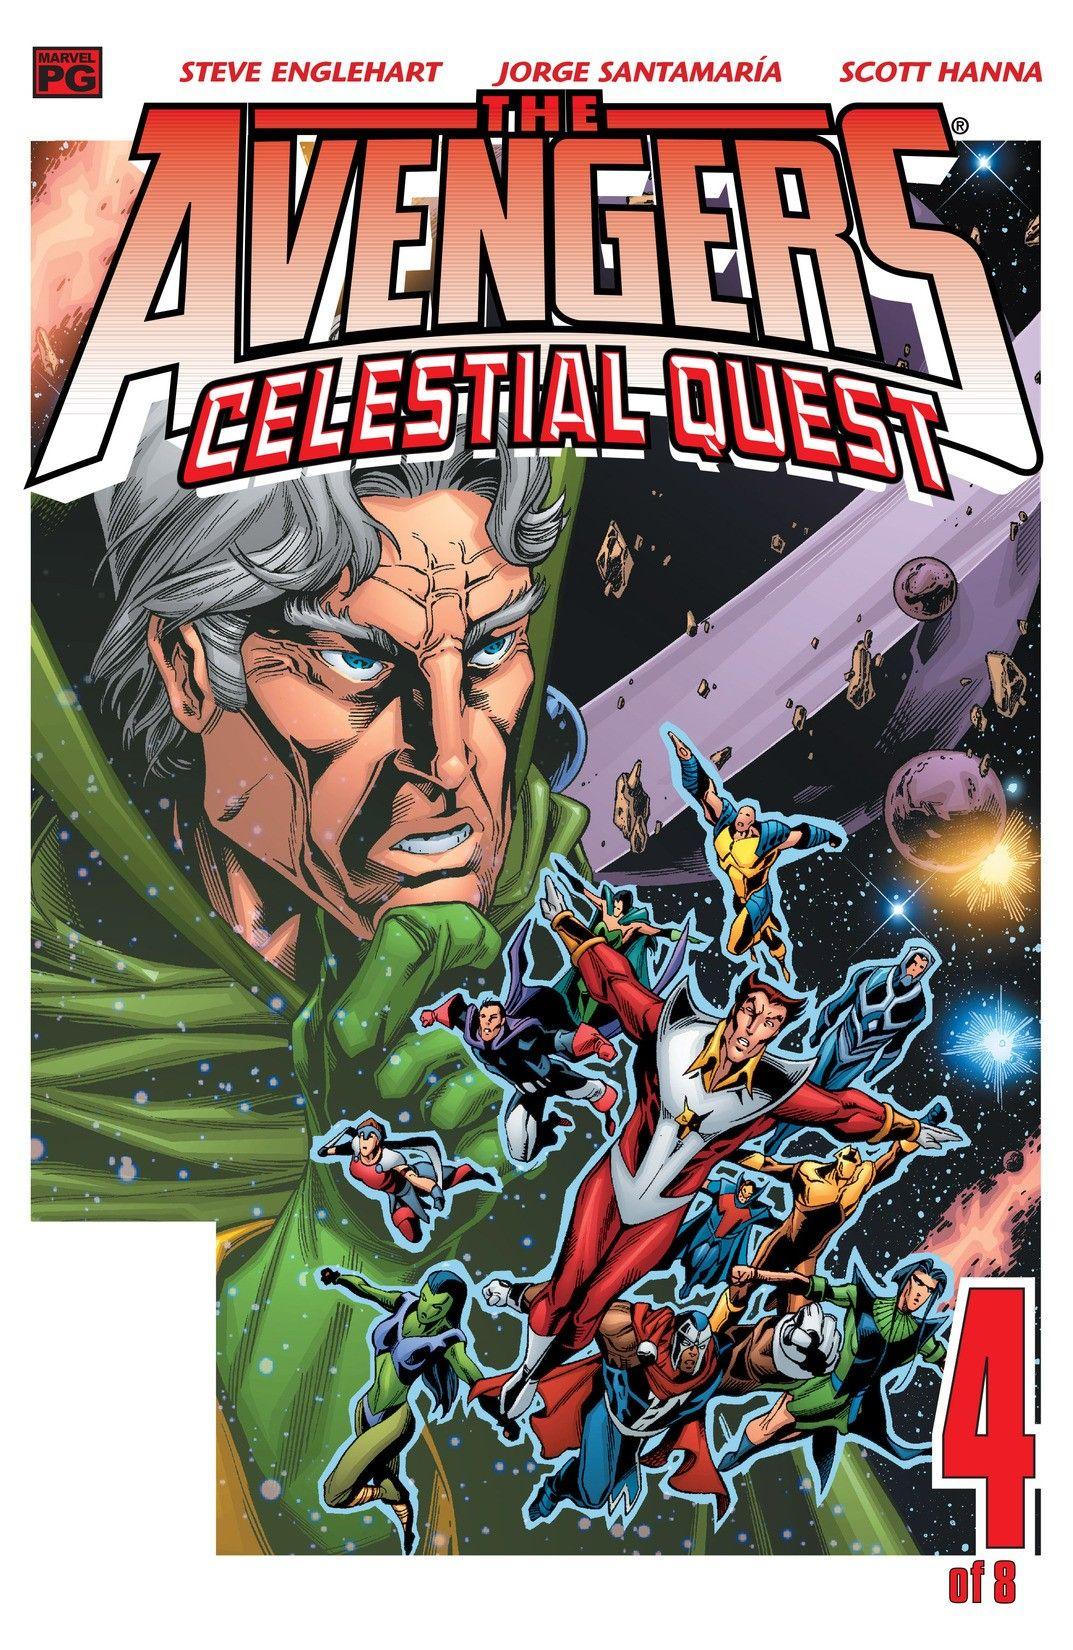 COLECCIÓN DEFINITIVA: GRANDES SAGAS MARVEL [UL] [cbr] Avengers_Celestial_Quest_Vol_1_4